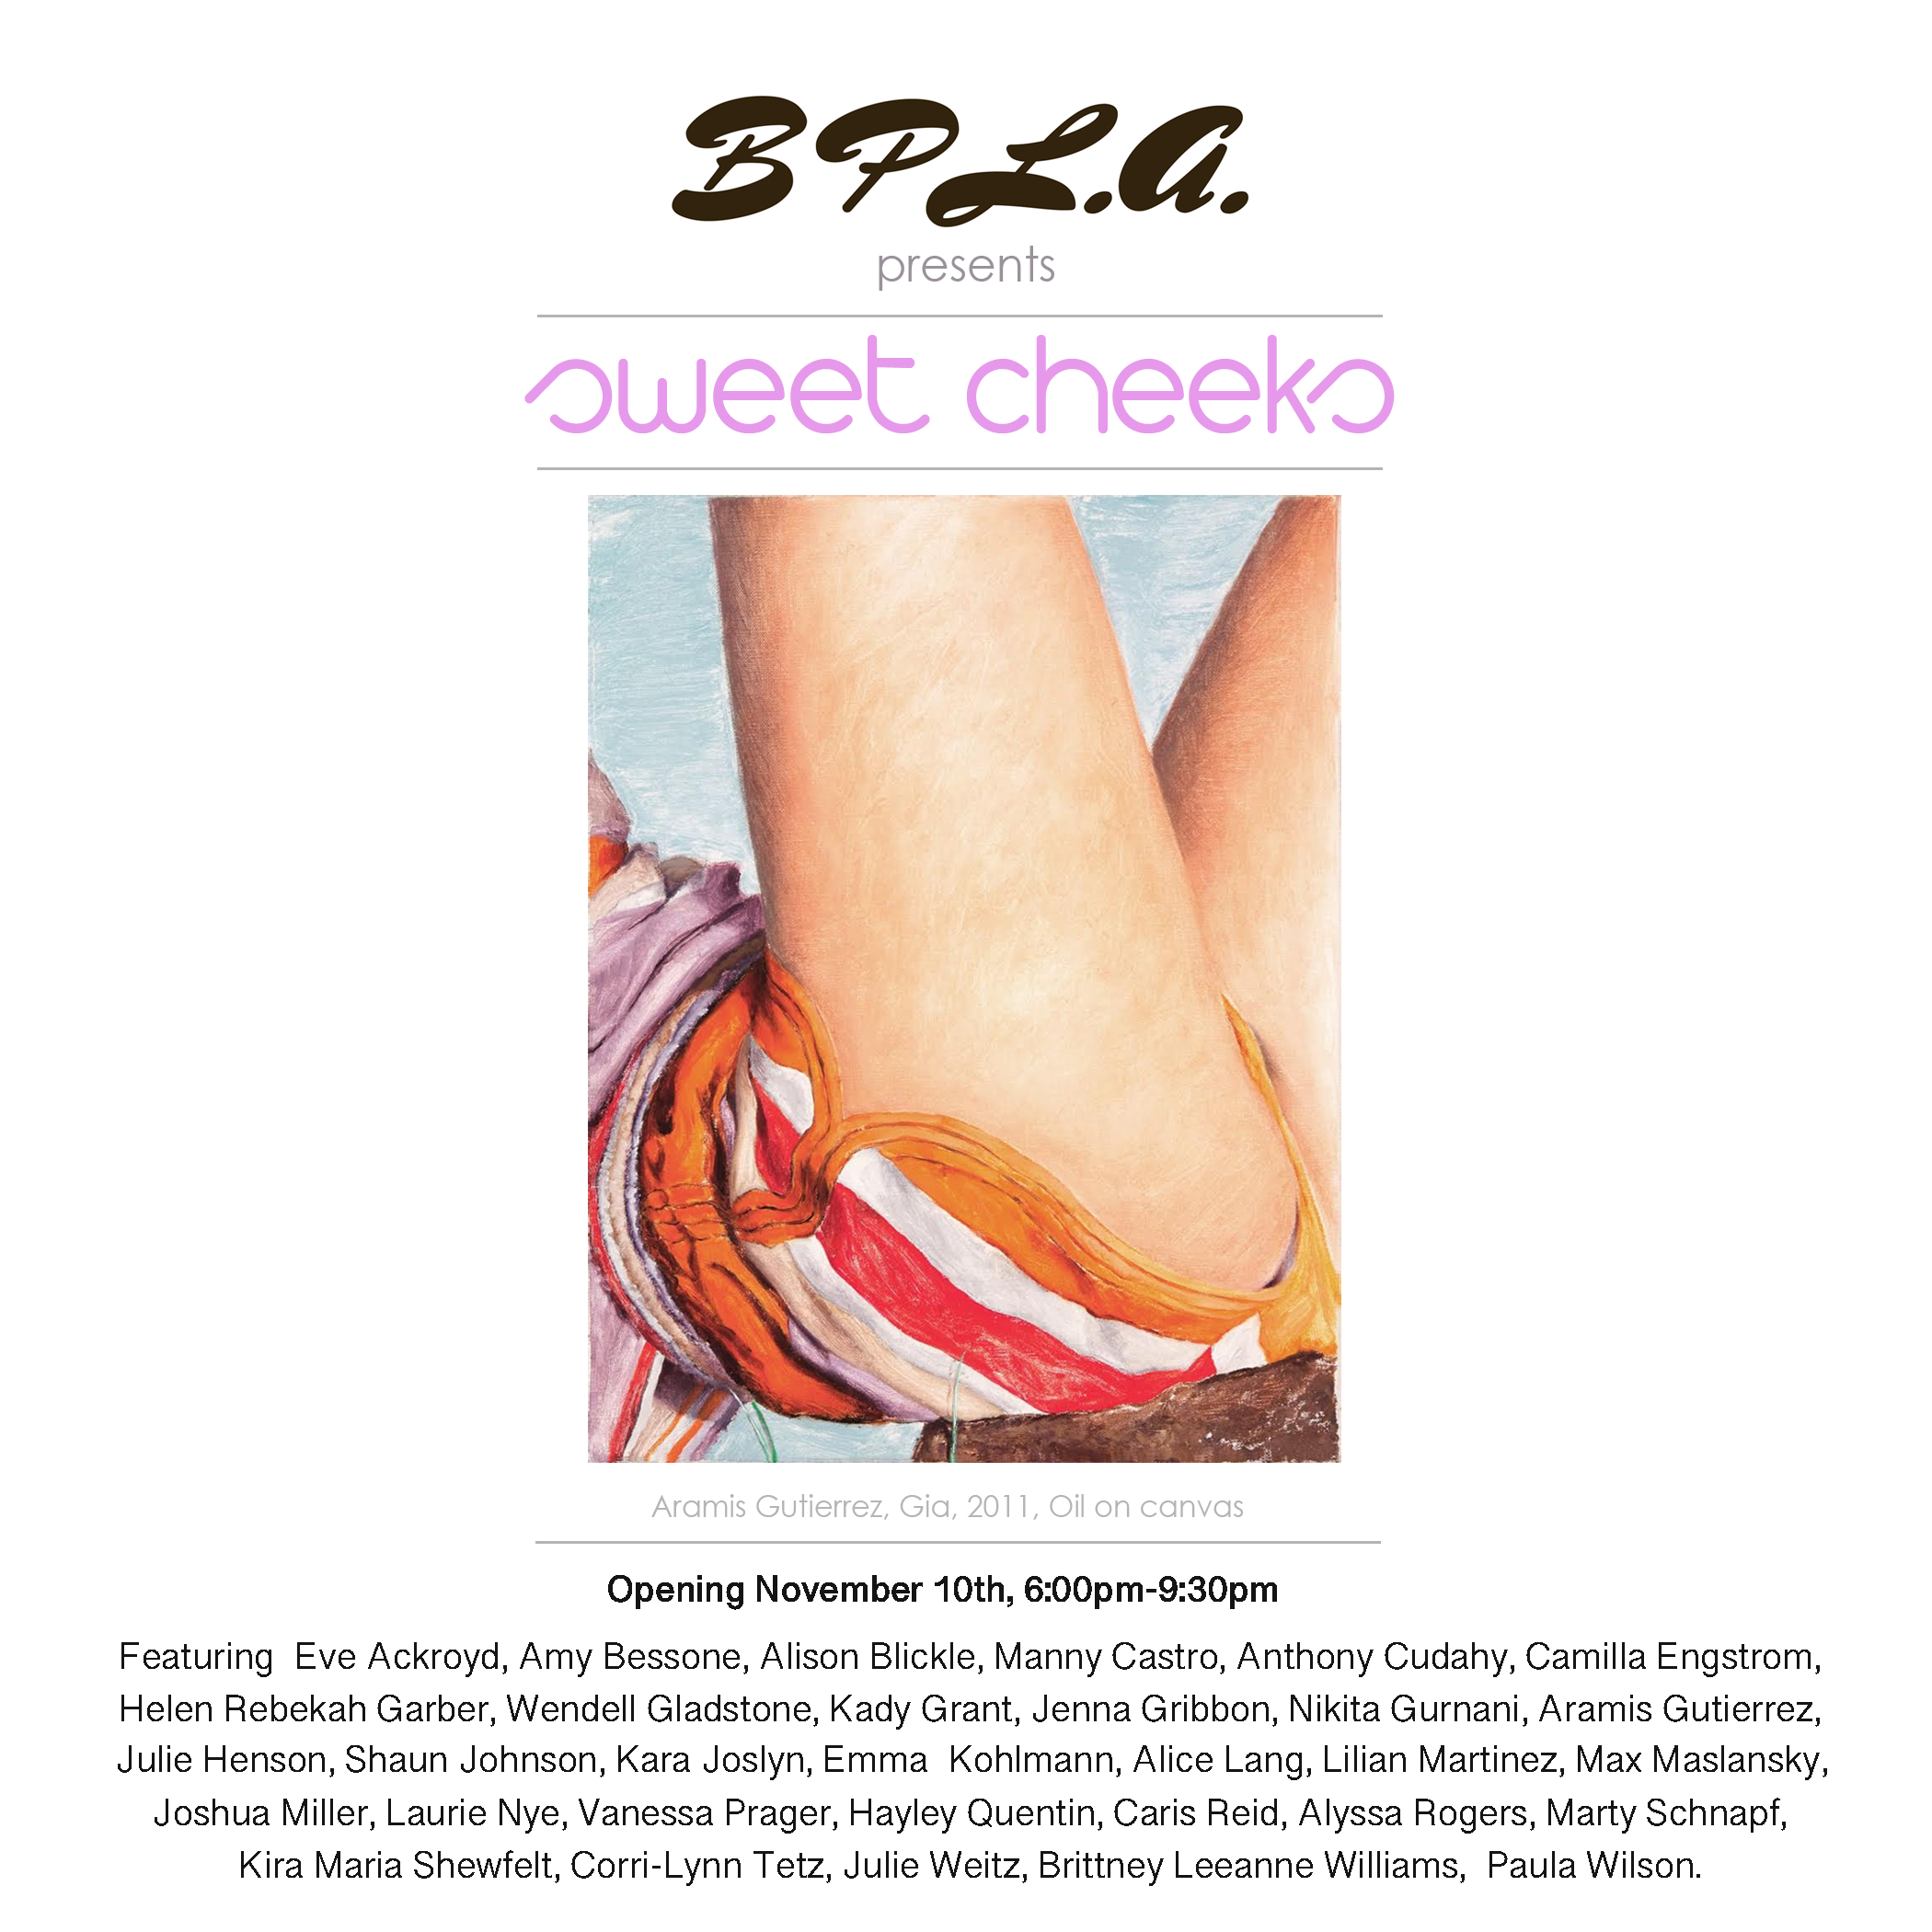 sweetcheeks-square.jpg